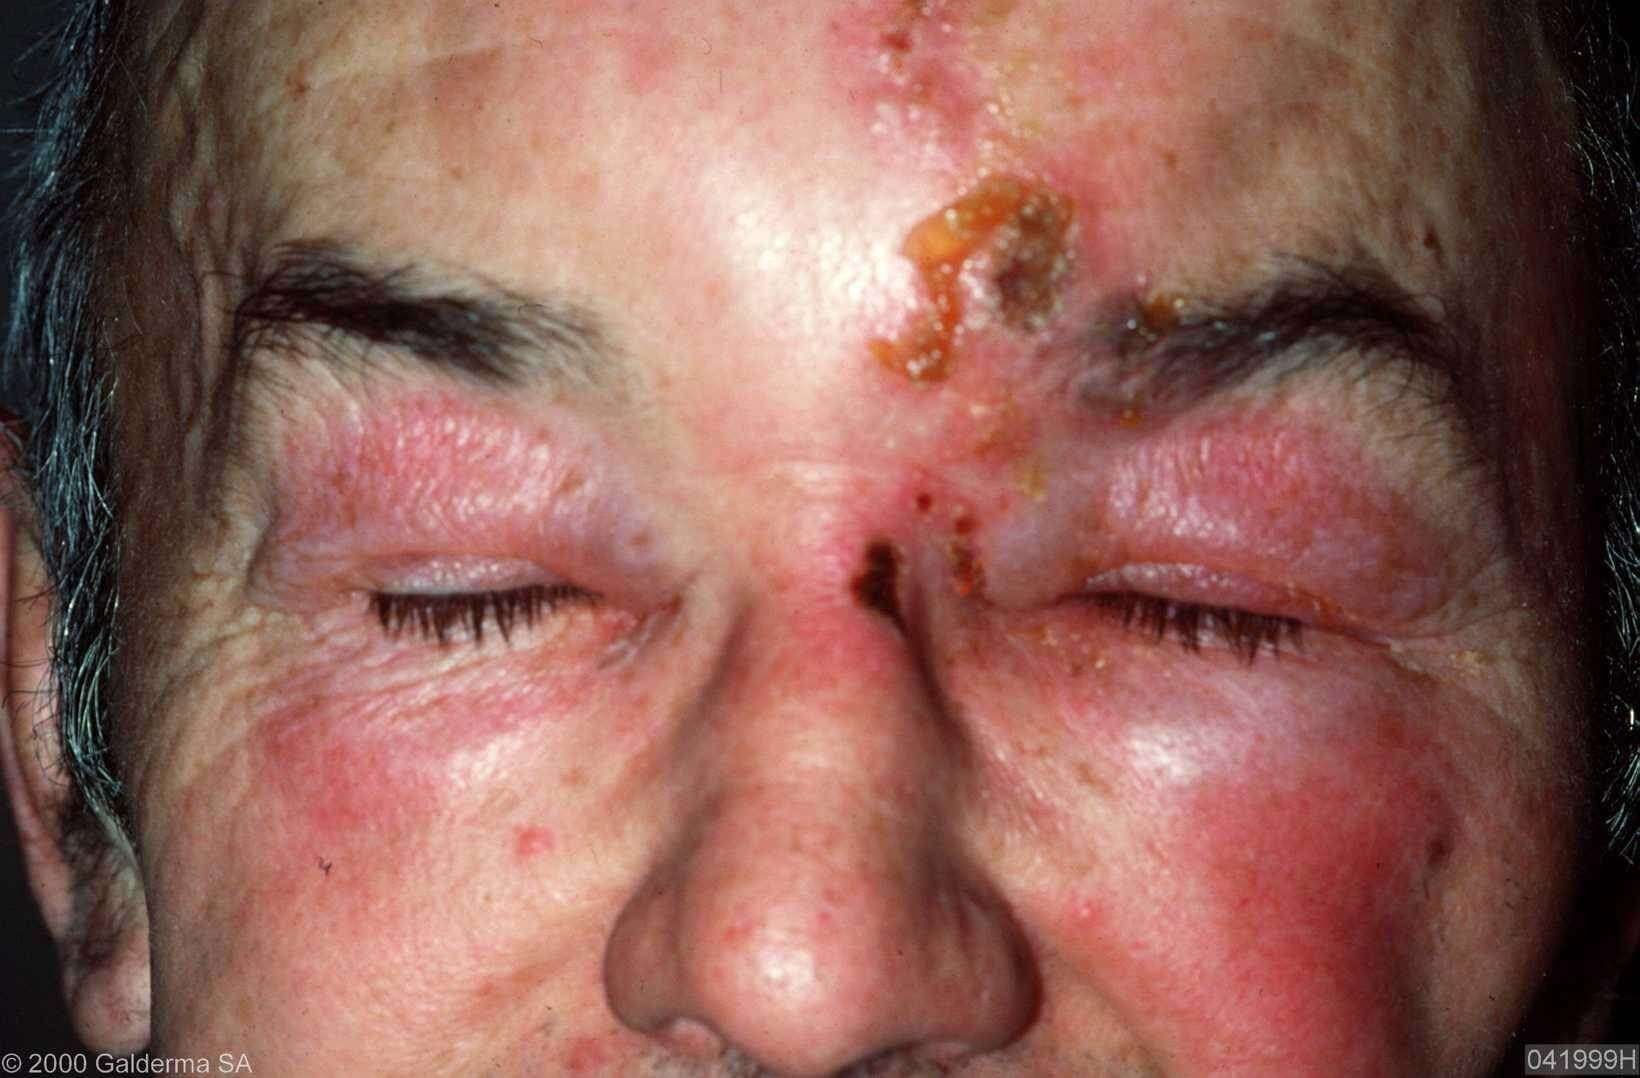 Gordelroos rondom het linker oog